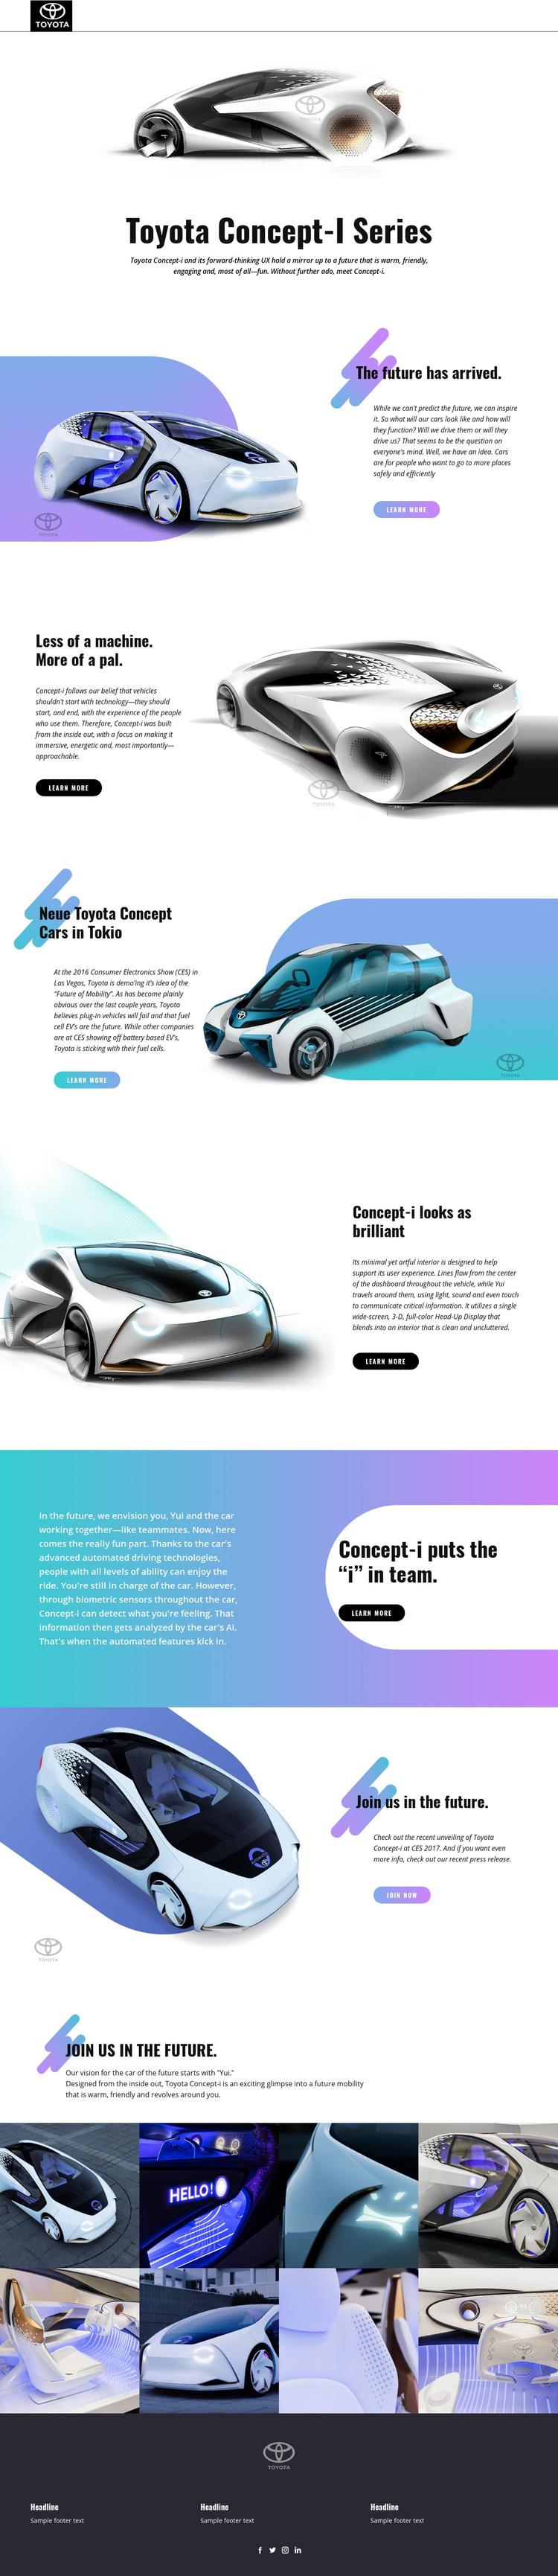 Advanced innovation cars Homepage Design